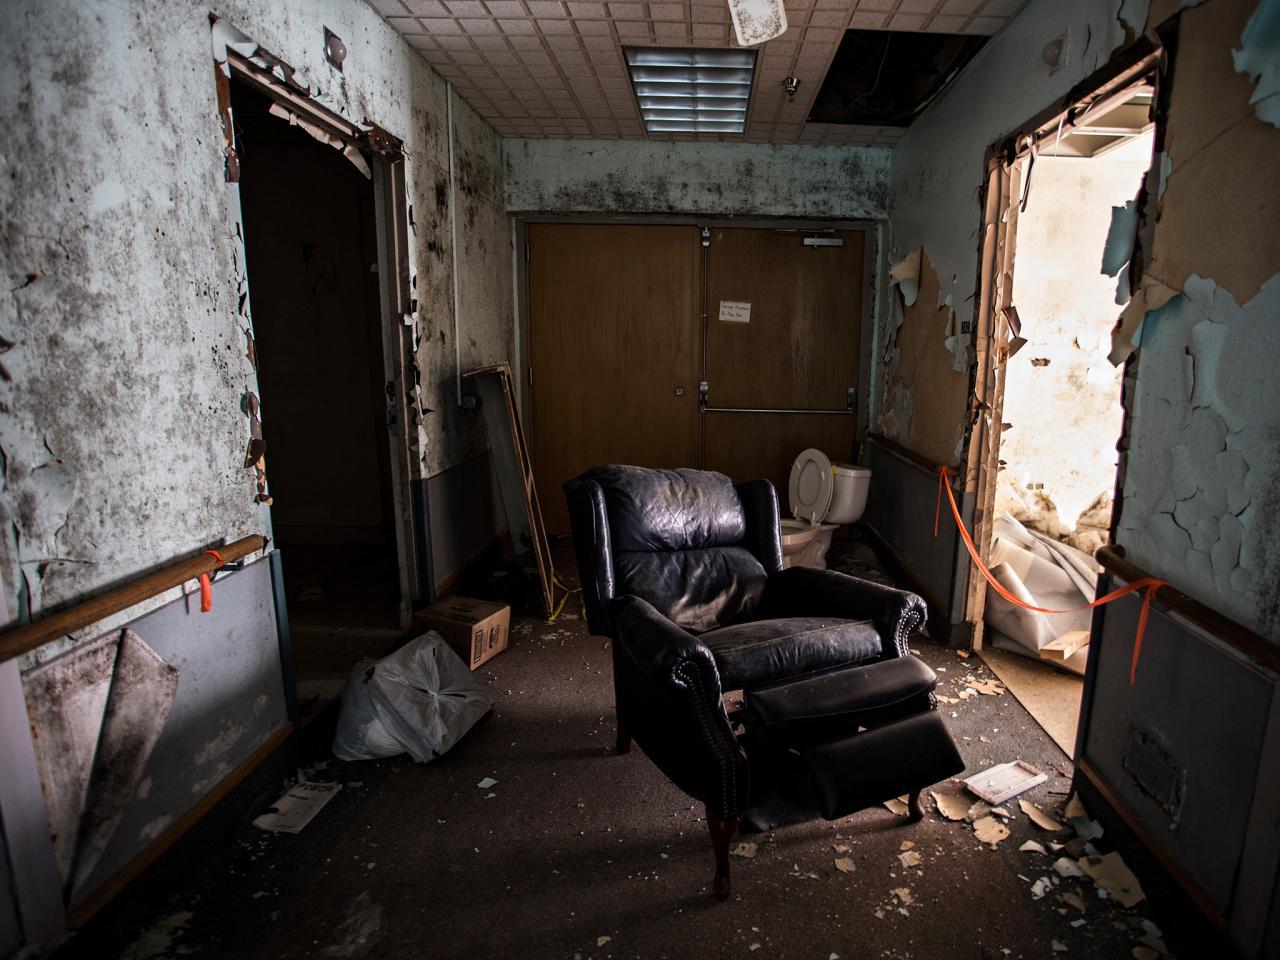 Nopeming Sanatorium Episode Ghost Adventures Wiki Fandom Powered